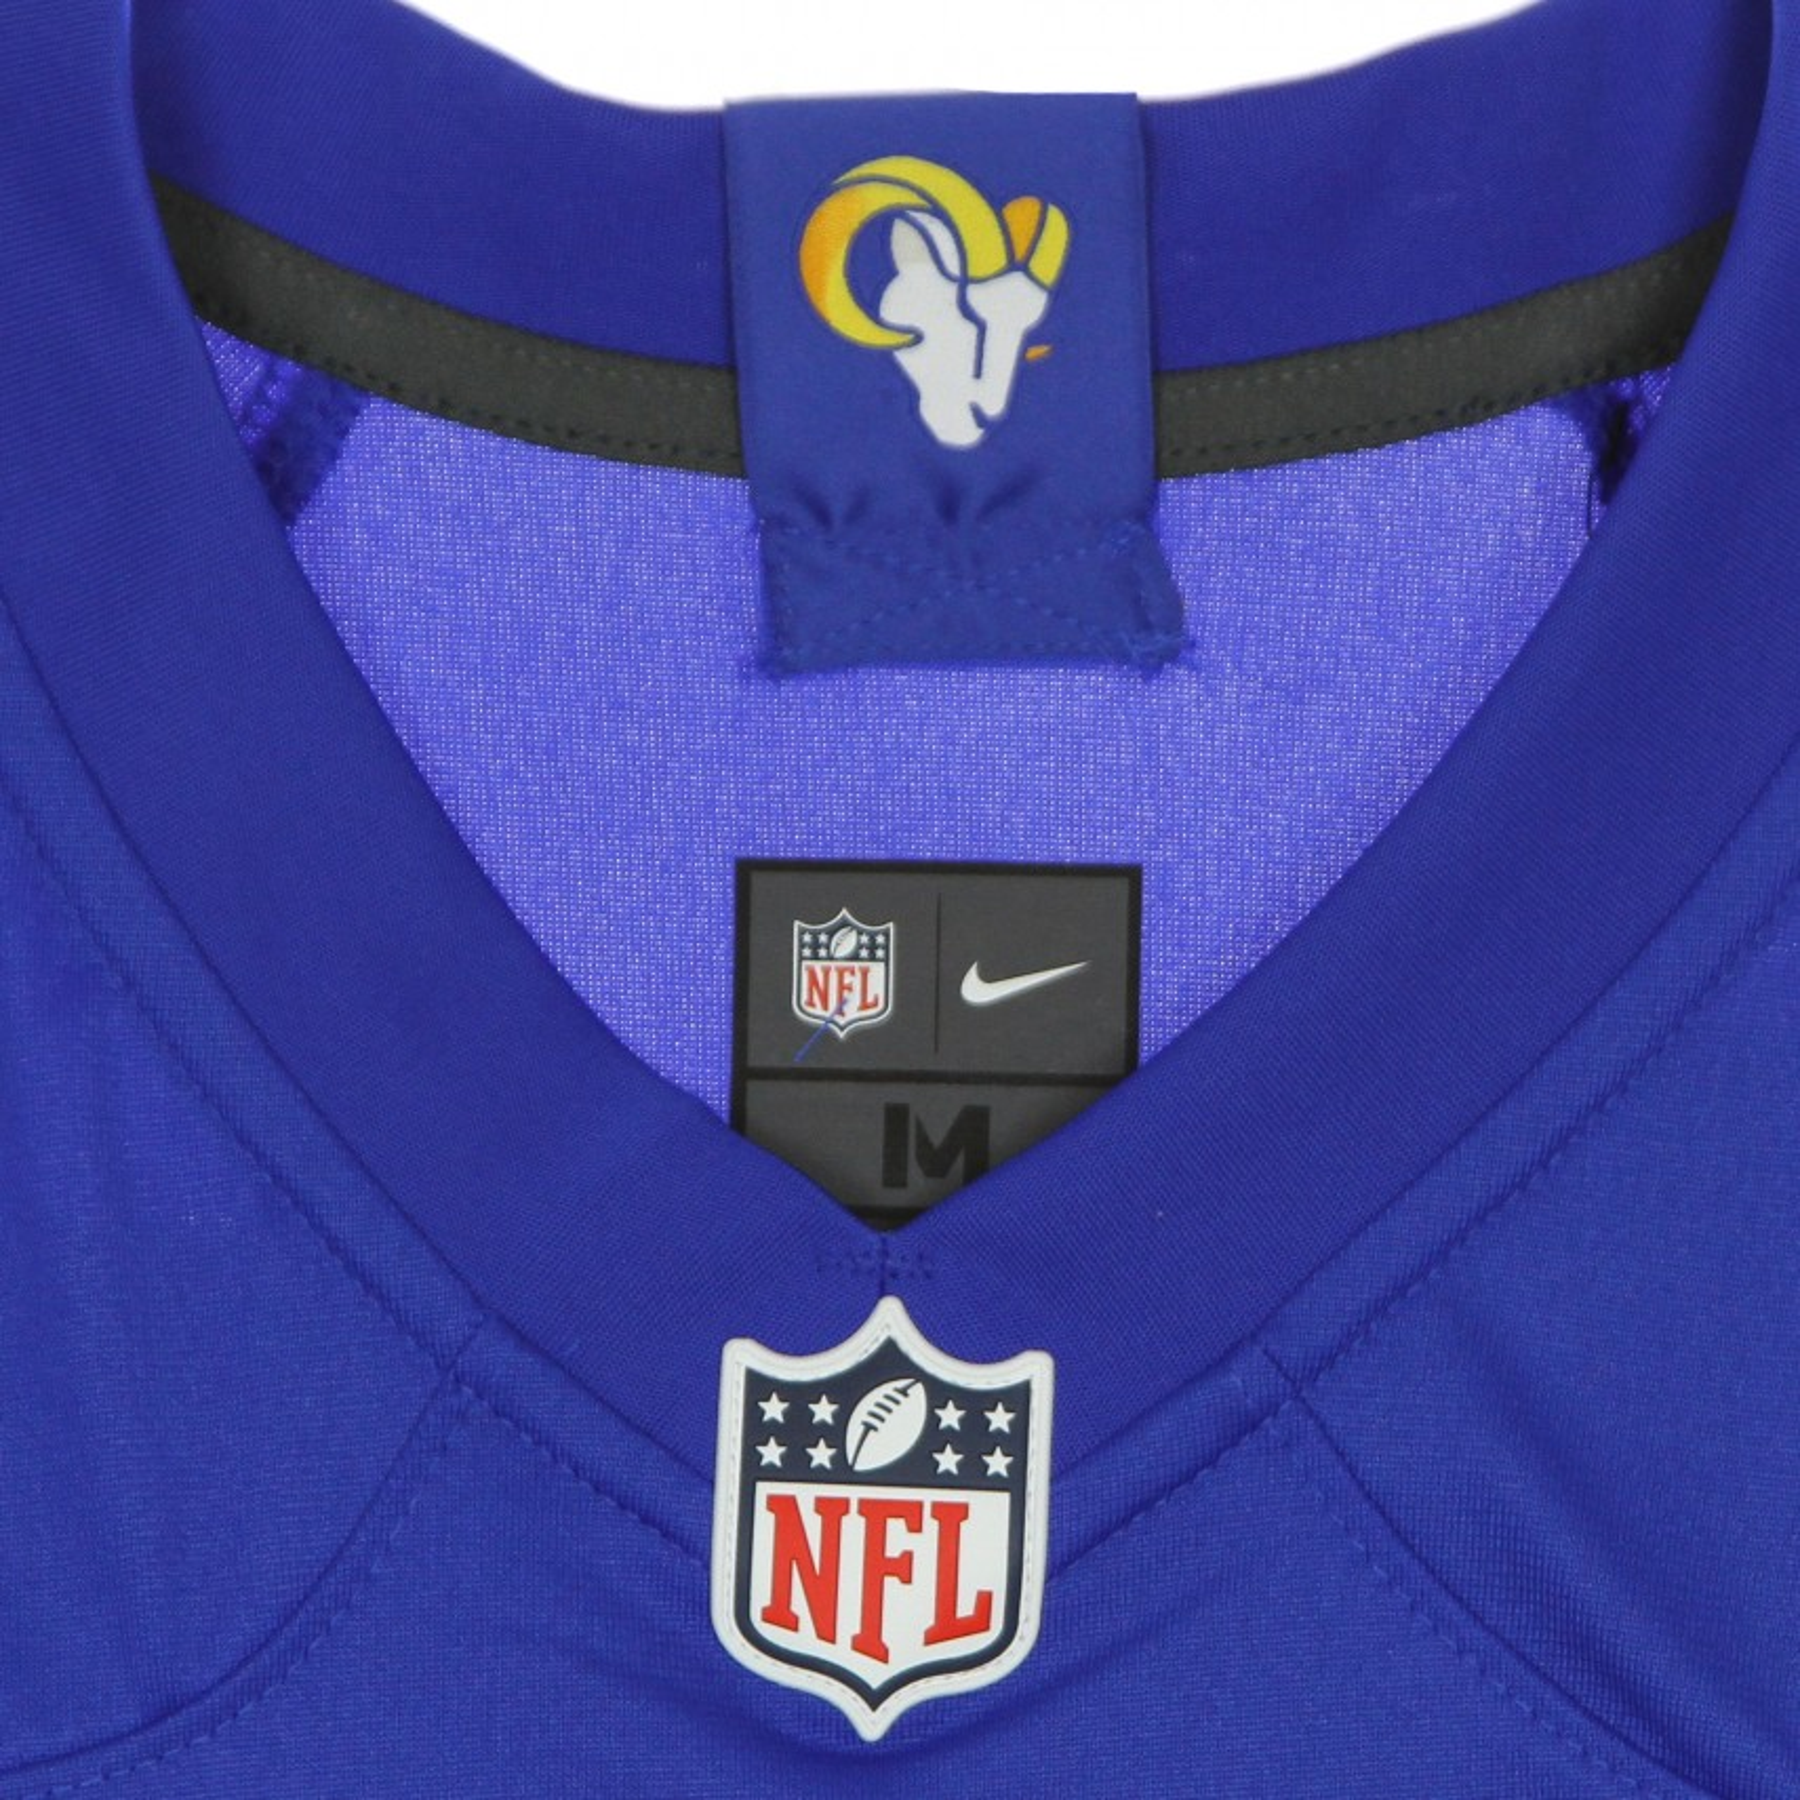 CASACCA FOOTBALL AMERICANO UOMO NFL GAME TEAM COLOUR JERSEY NO 99 DONALD LOSRAM M